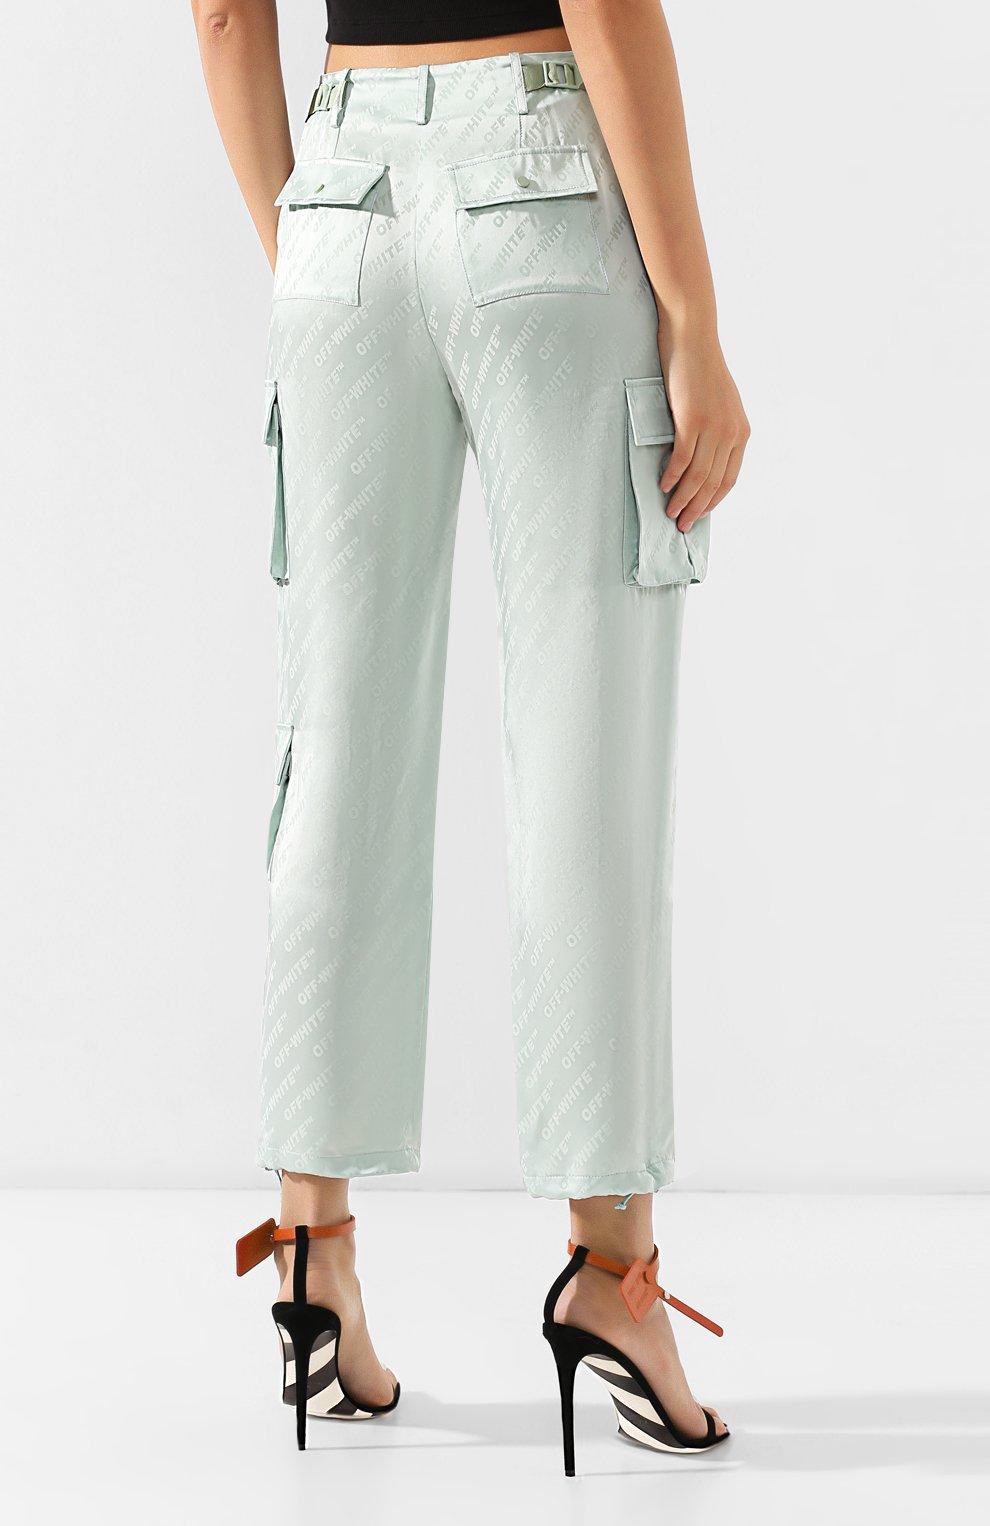 Женские брюки с накладными карманами OFF-WHITE зеленого цвета, арт. 0WCF004R19C860574100 | Фото 4